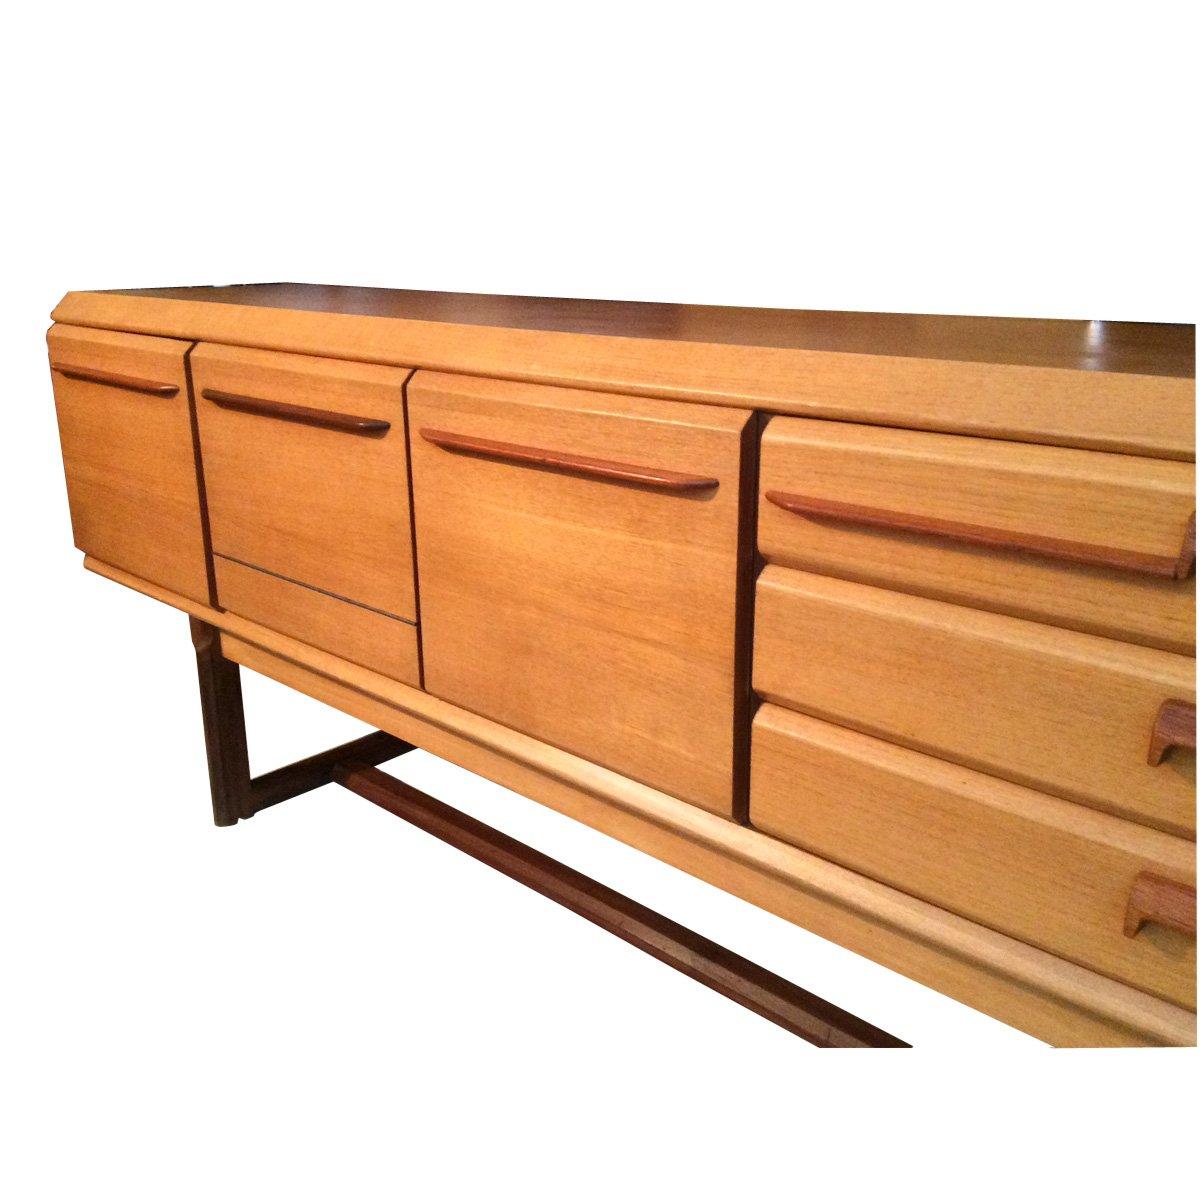 Langes sideboard aus dänemark, 1970 bei pamono kaufen